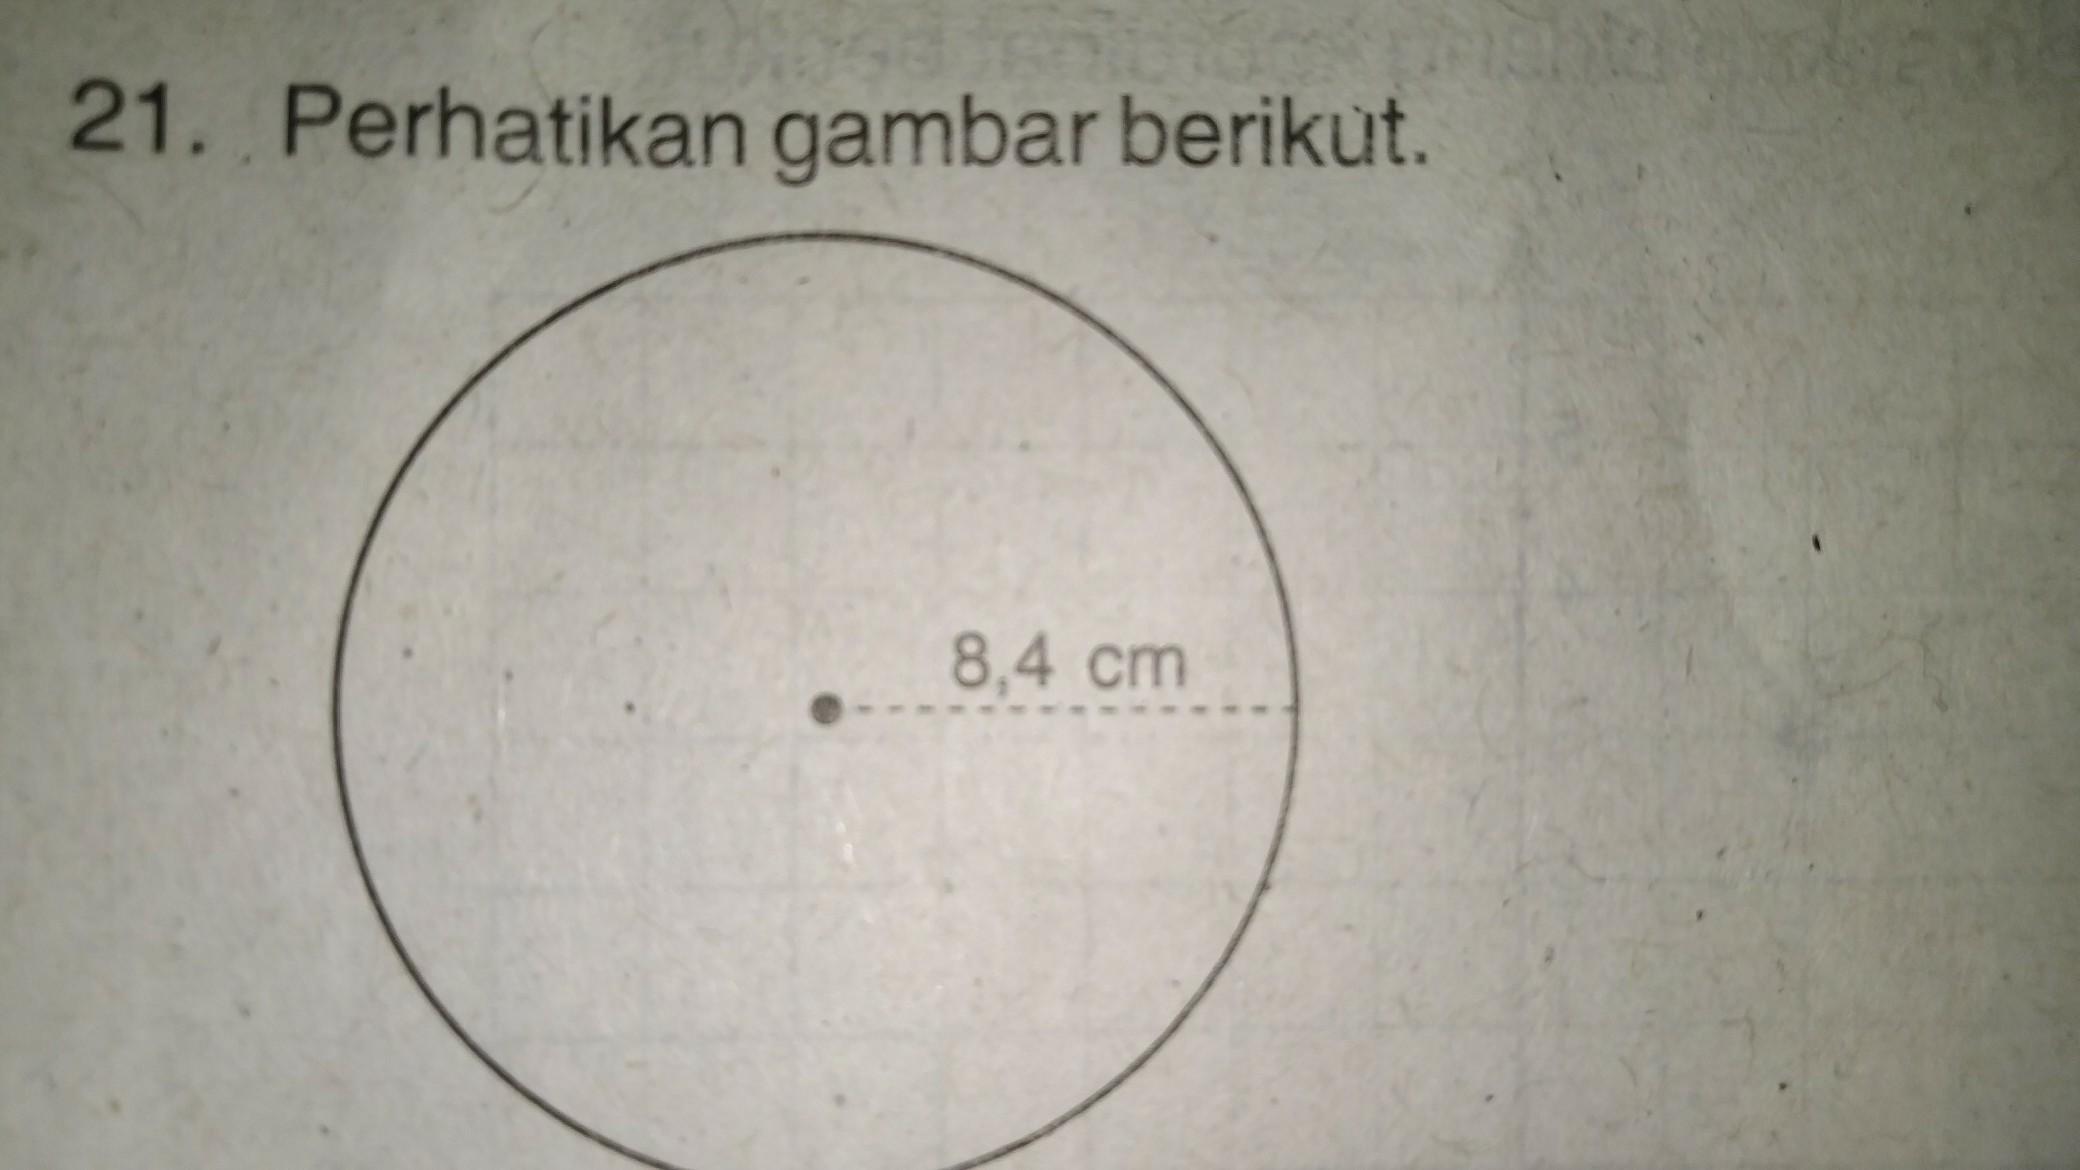 Luas Lingkaran Pada Gambar Adalah Brainly Co Id